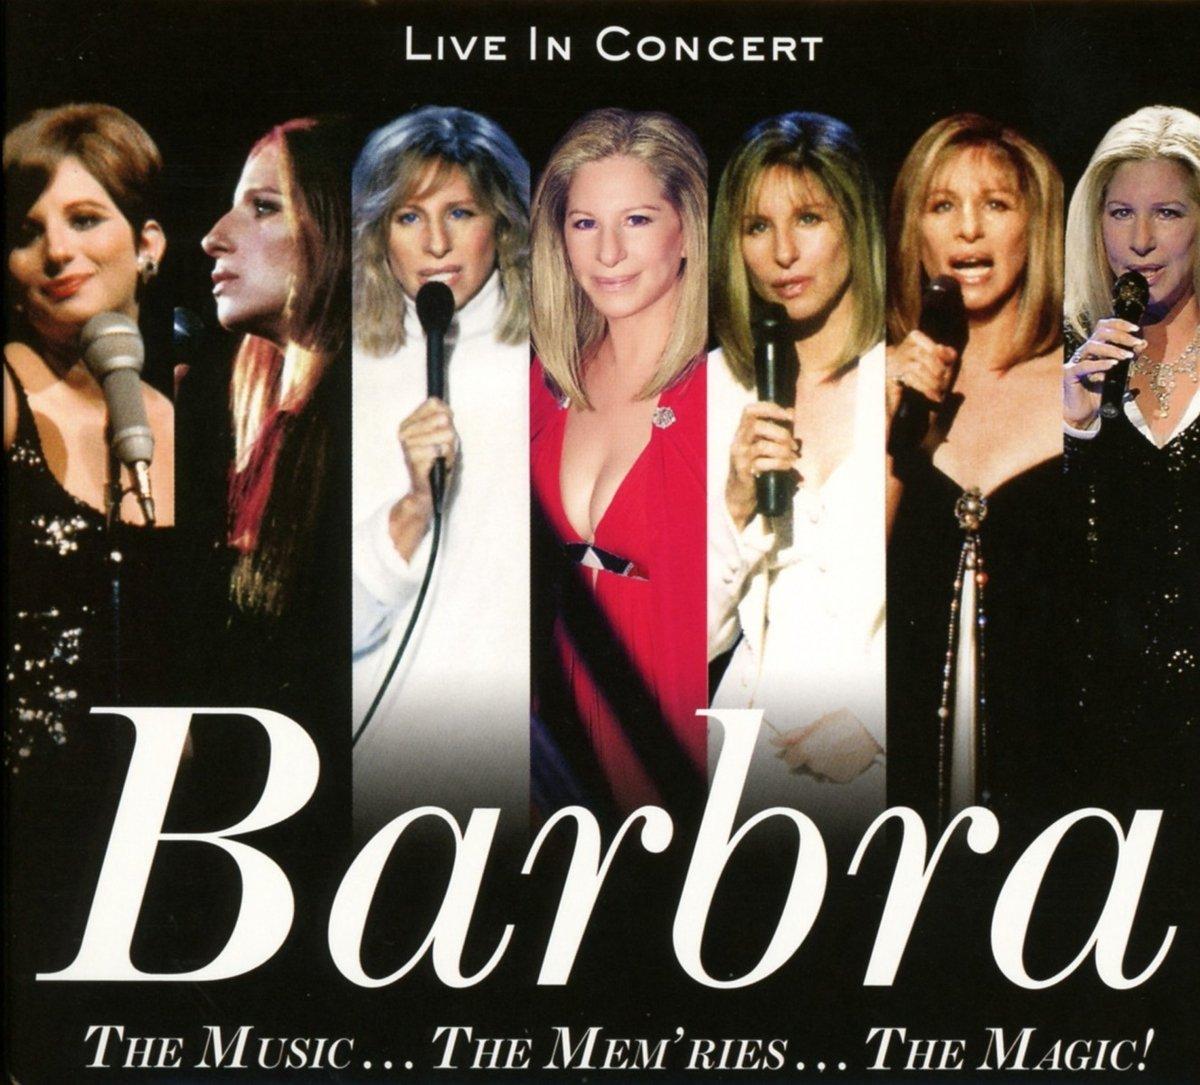 Barbra Streisand - The Music...The Mem\'ries...The Magic! (Digipack Packaging, 2PC)